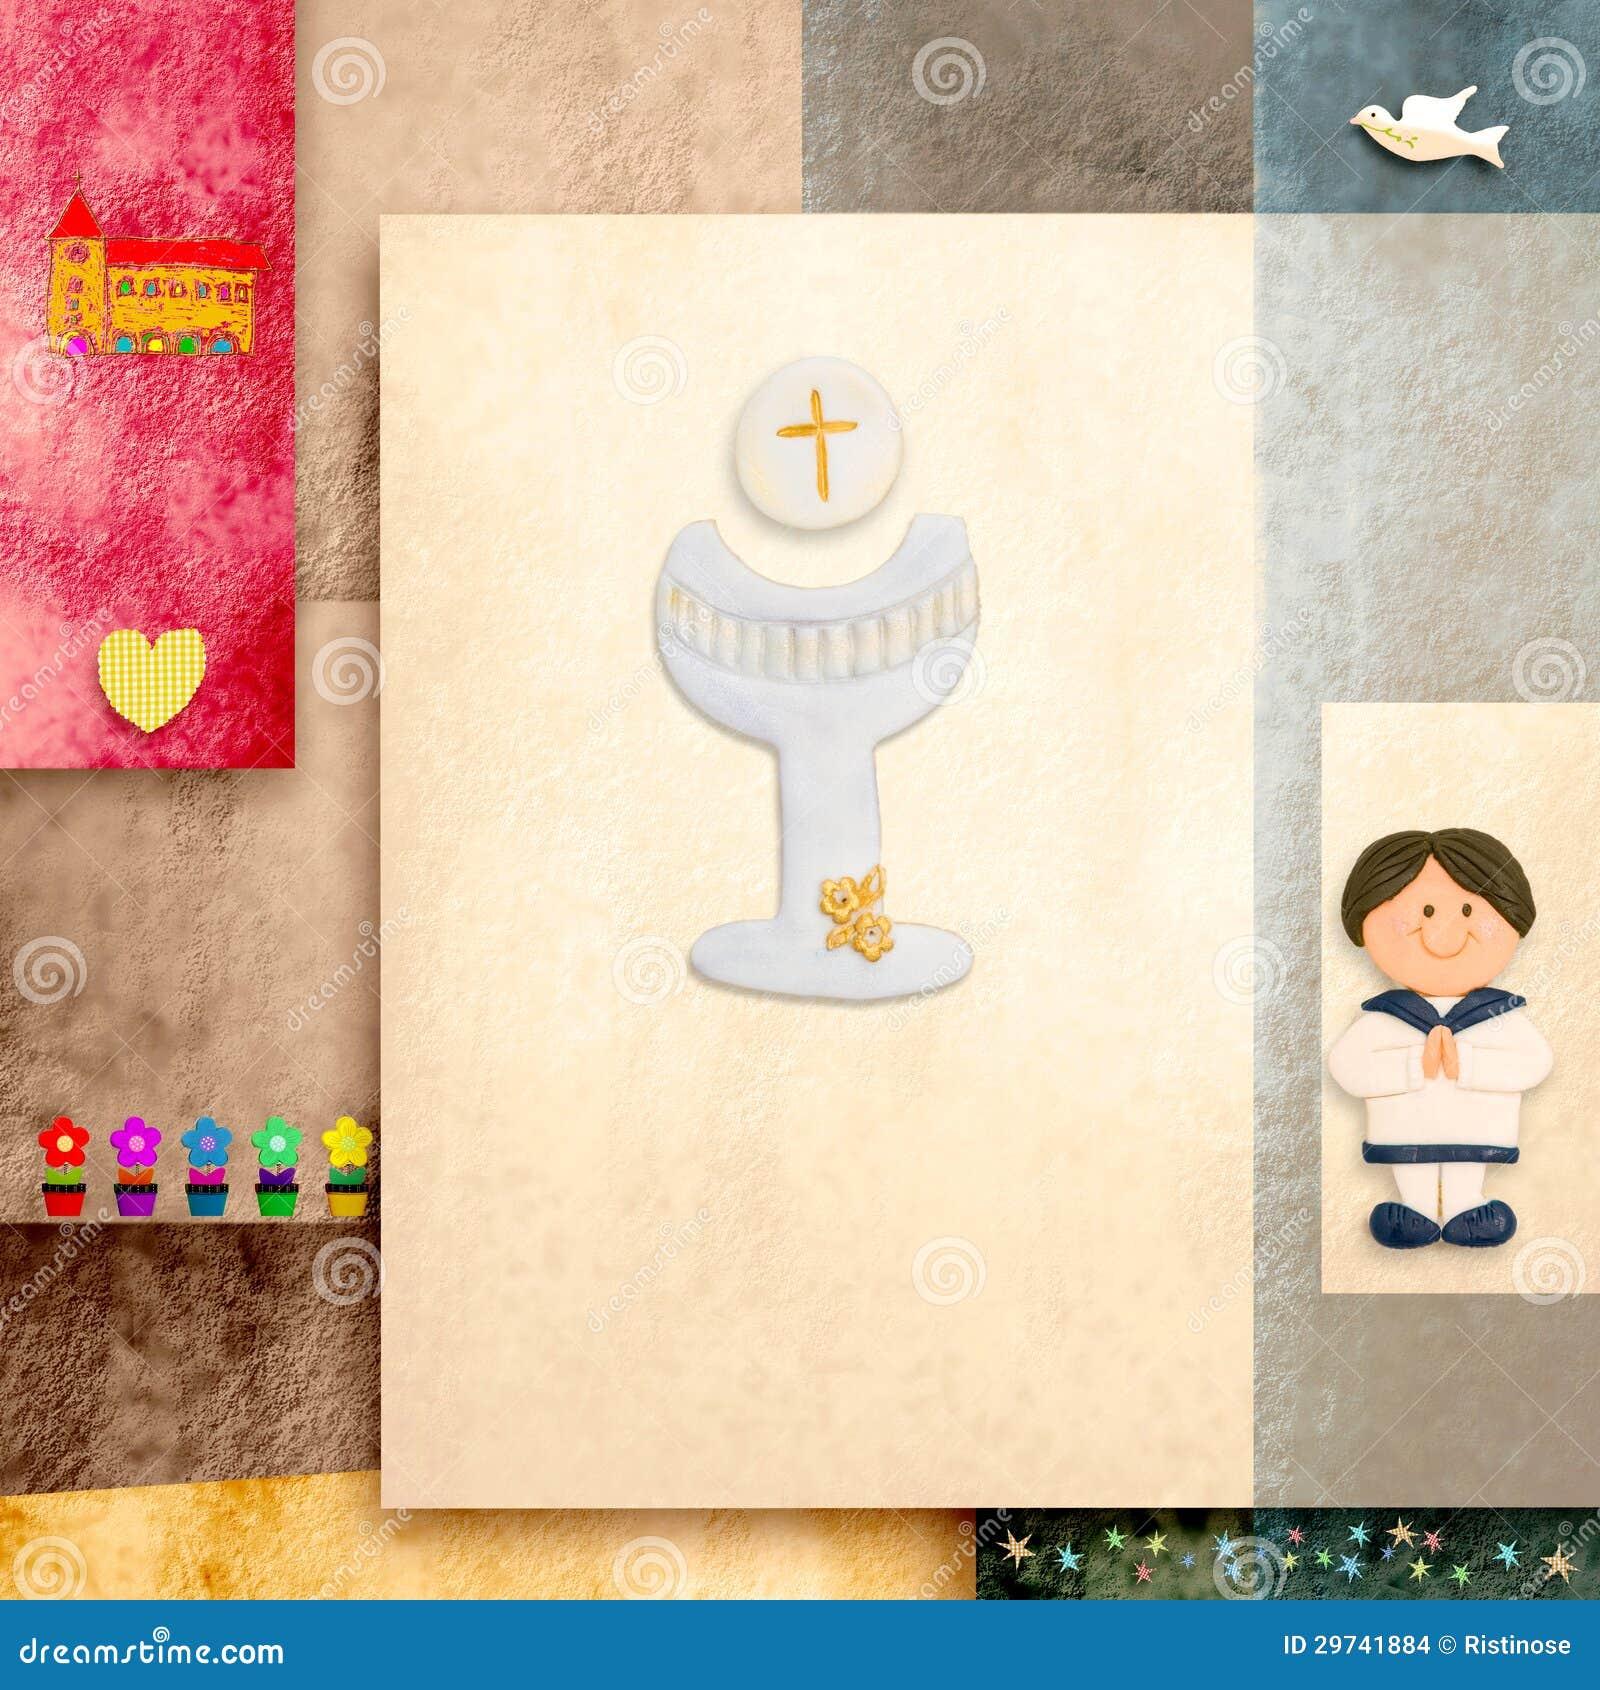 First Communion Invitations Free Printable for adorable invitations design